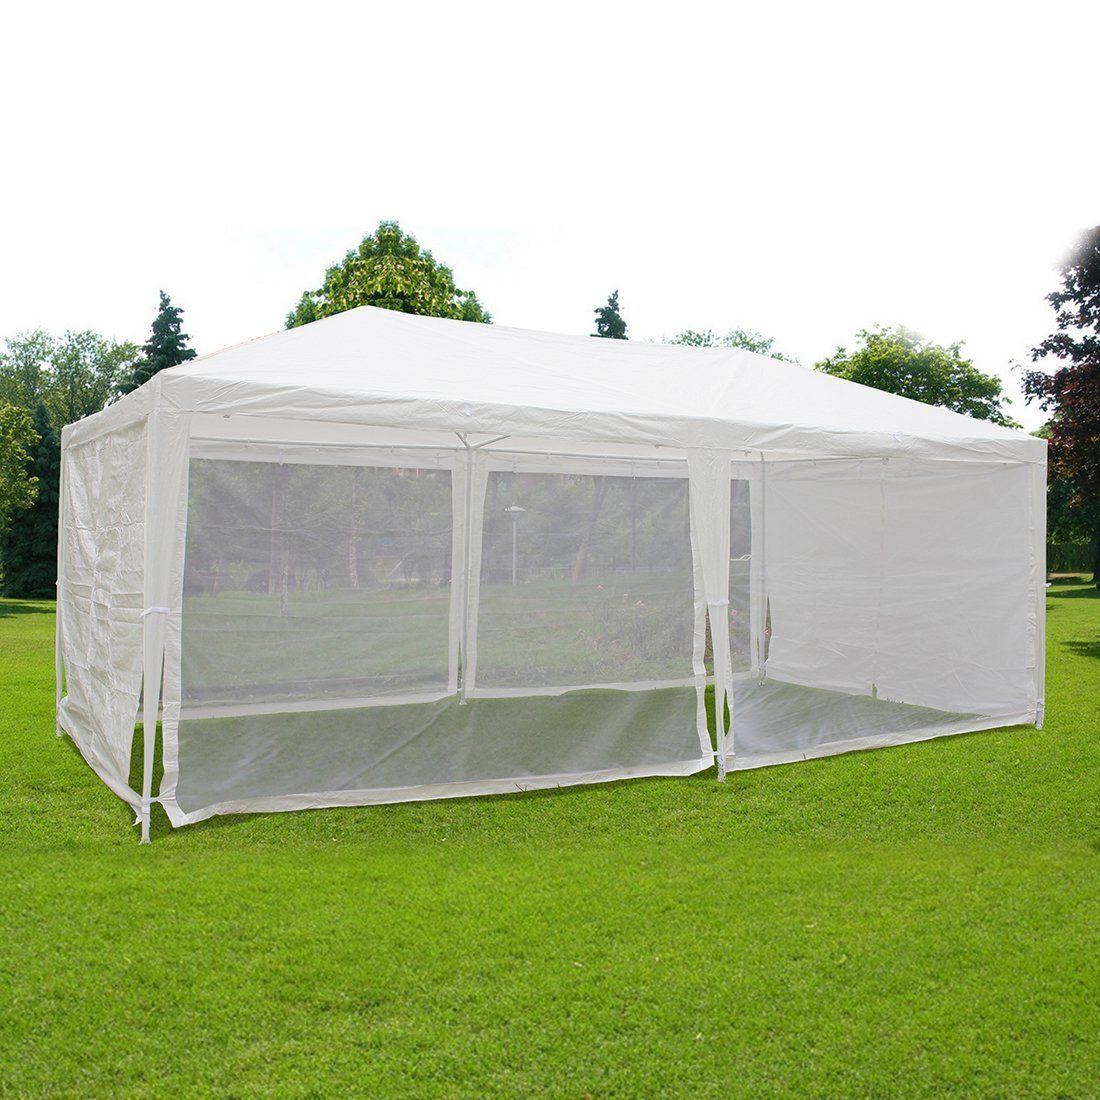 Enclosed canopy walmart